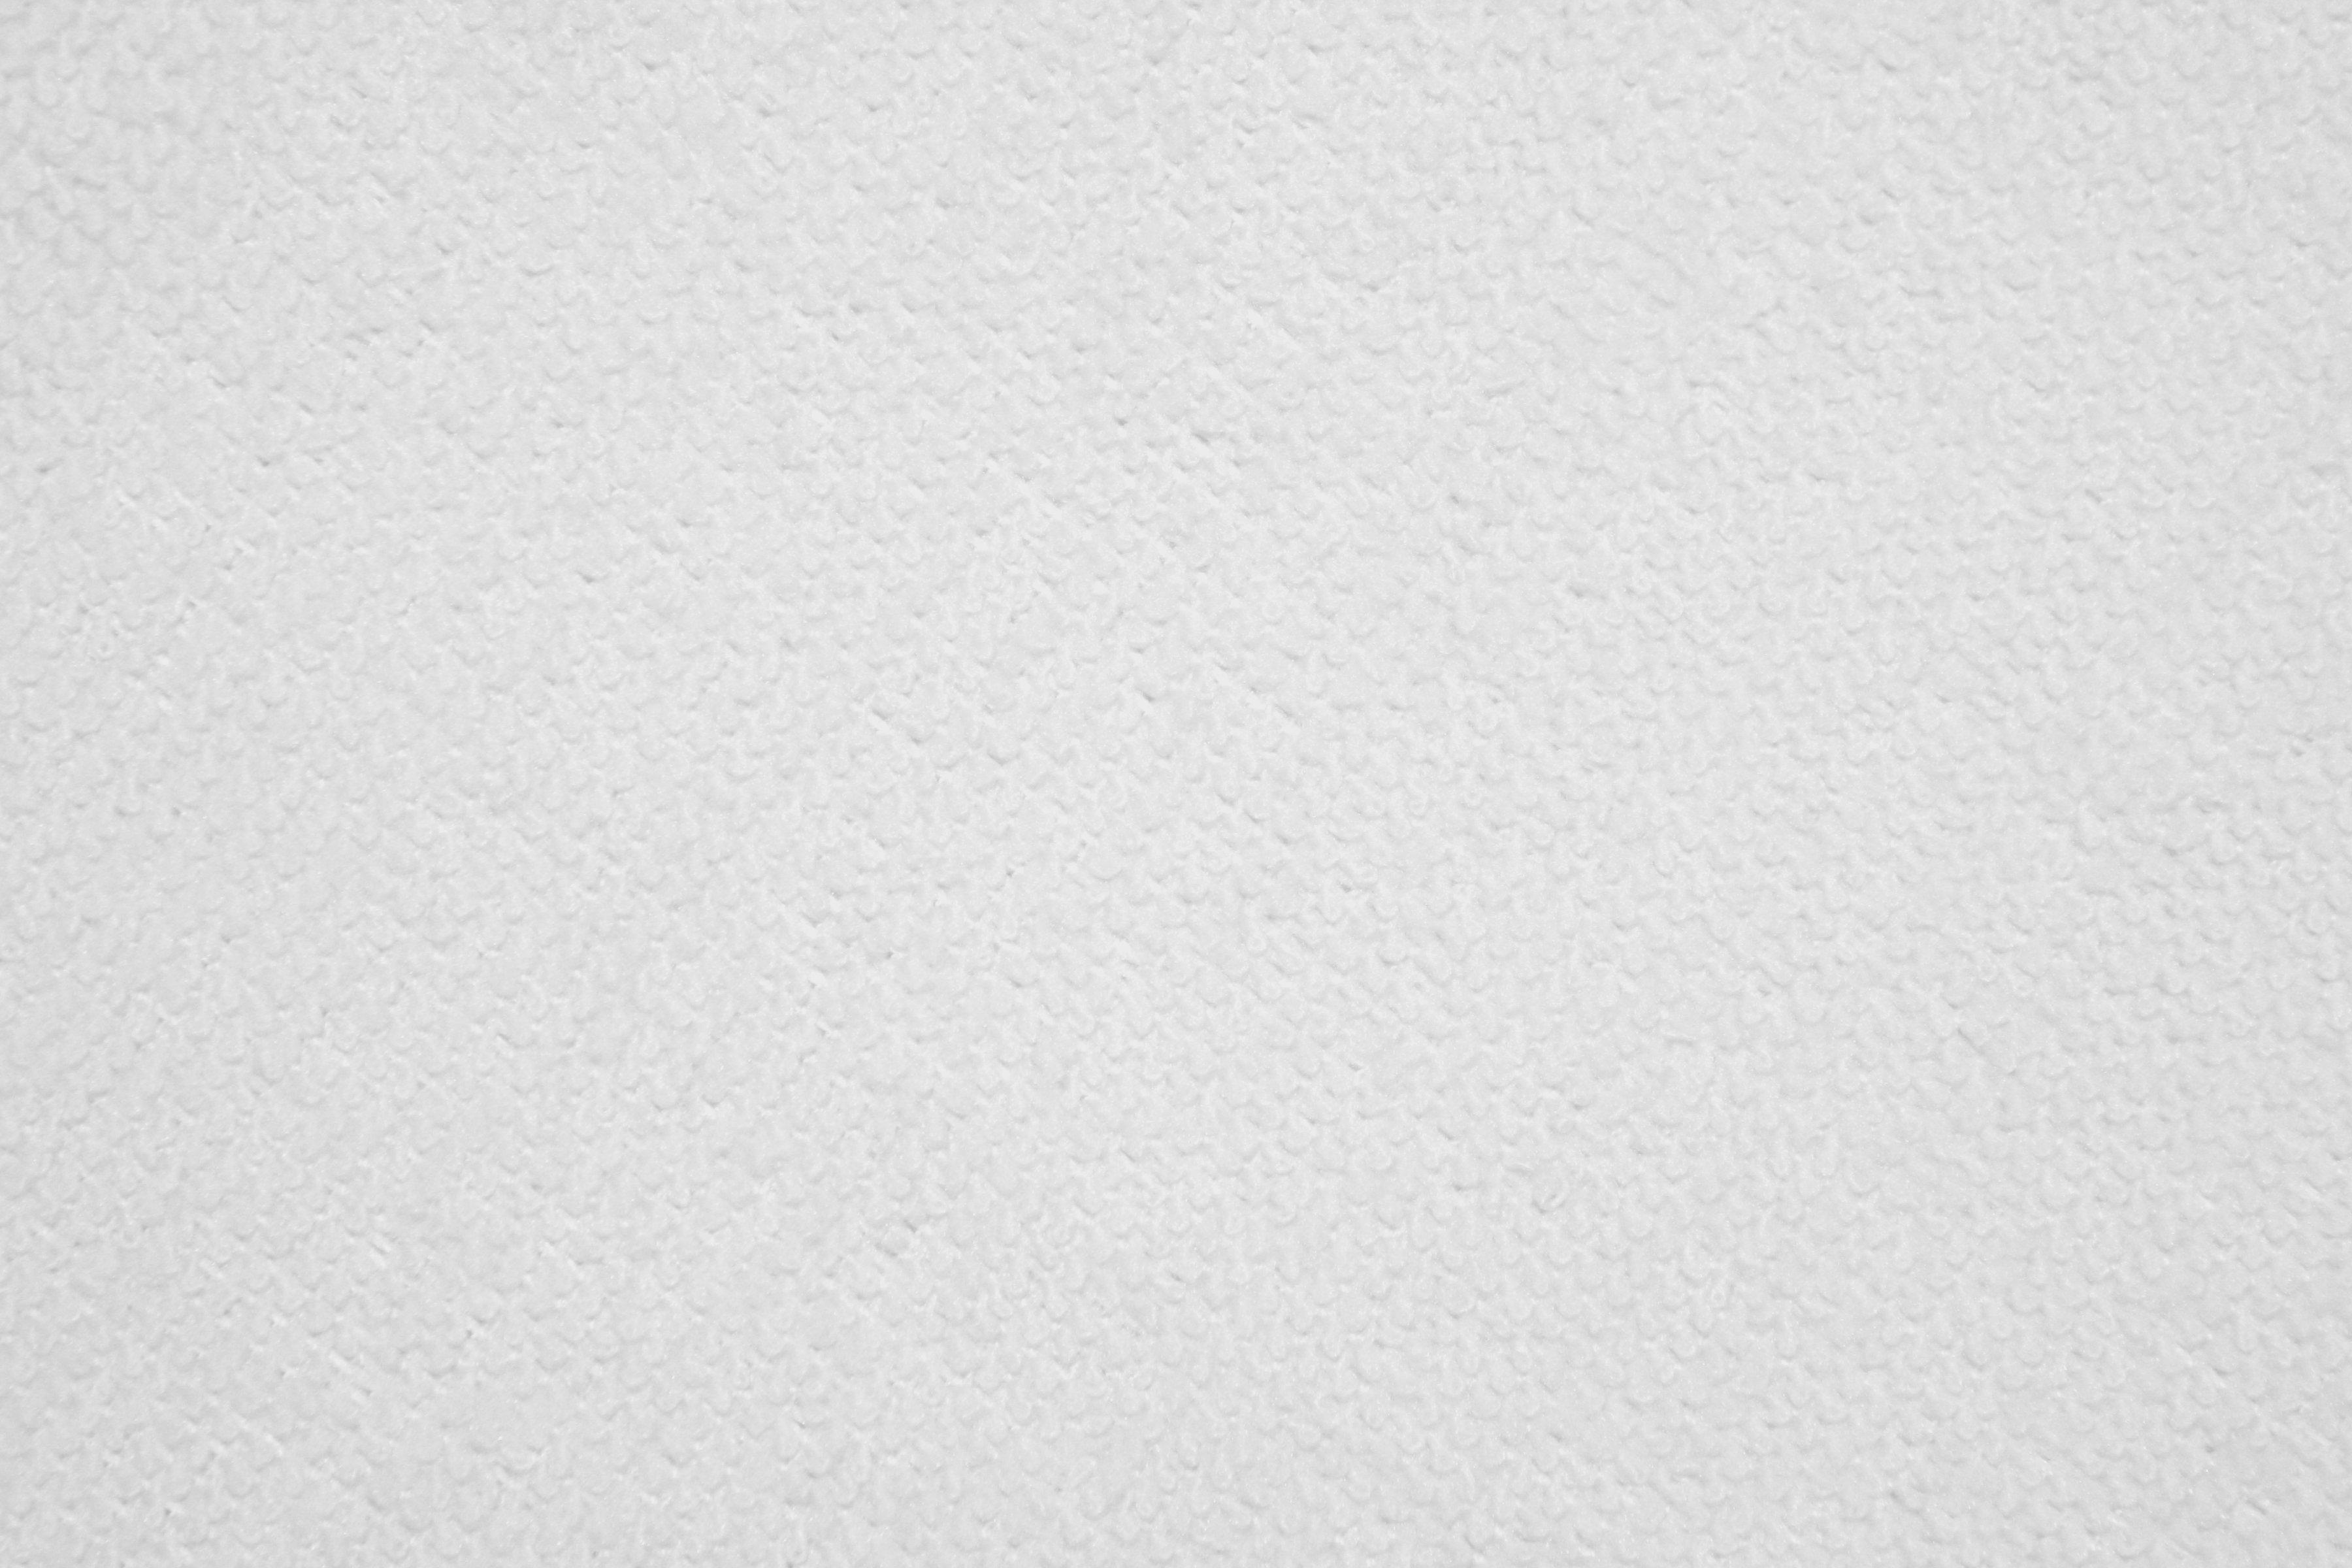 Wild textures free high resolution textures backgrounds and - Free High Resolution Fabric Textures Wild Textures Free High Resolution Fabric Textures Wild Textures White